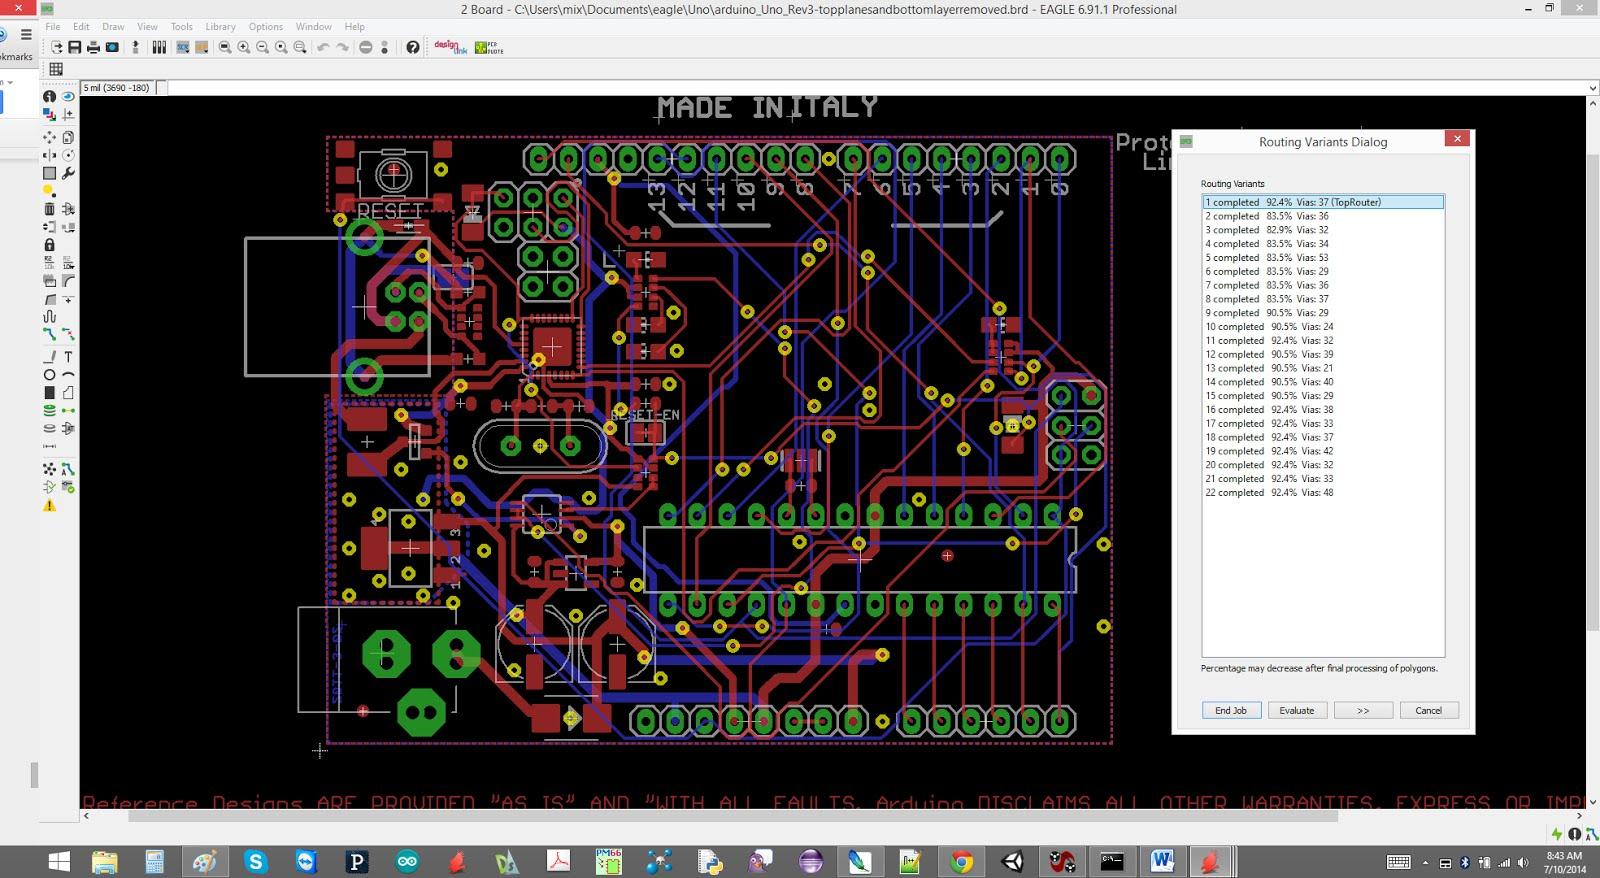 Eagle v7 Beta Review! | element14 | Autodesk EAGLE